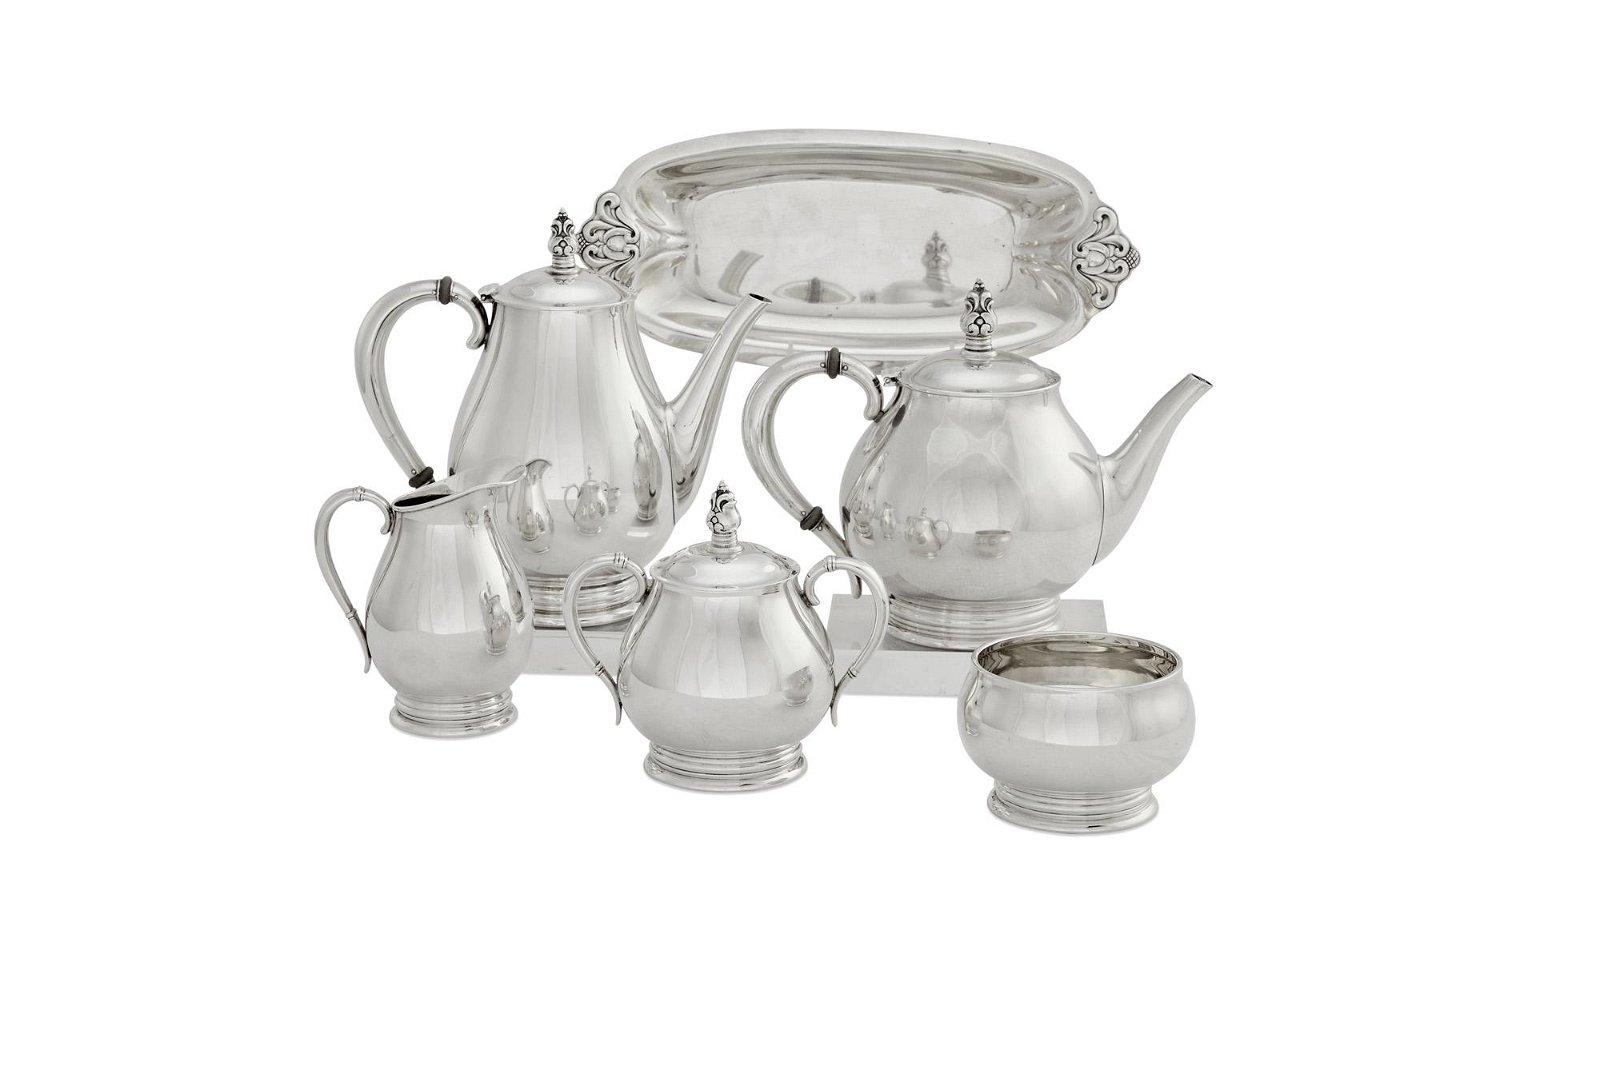 Royal Danish silver six piece tea service